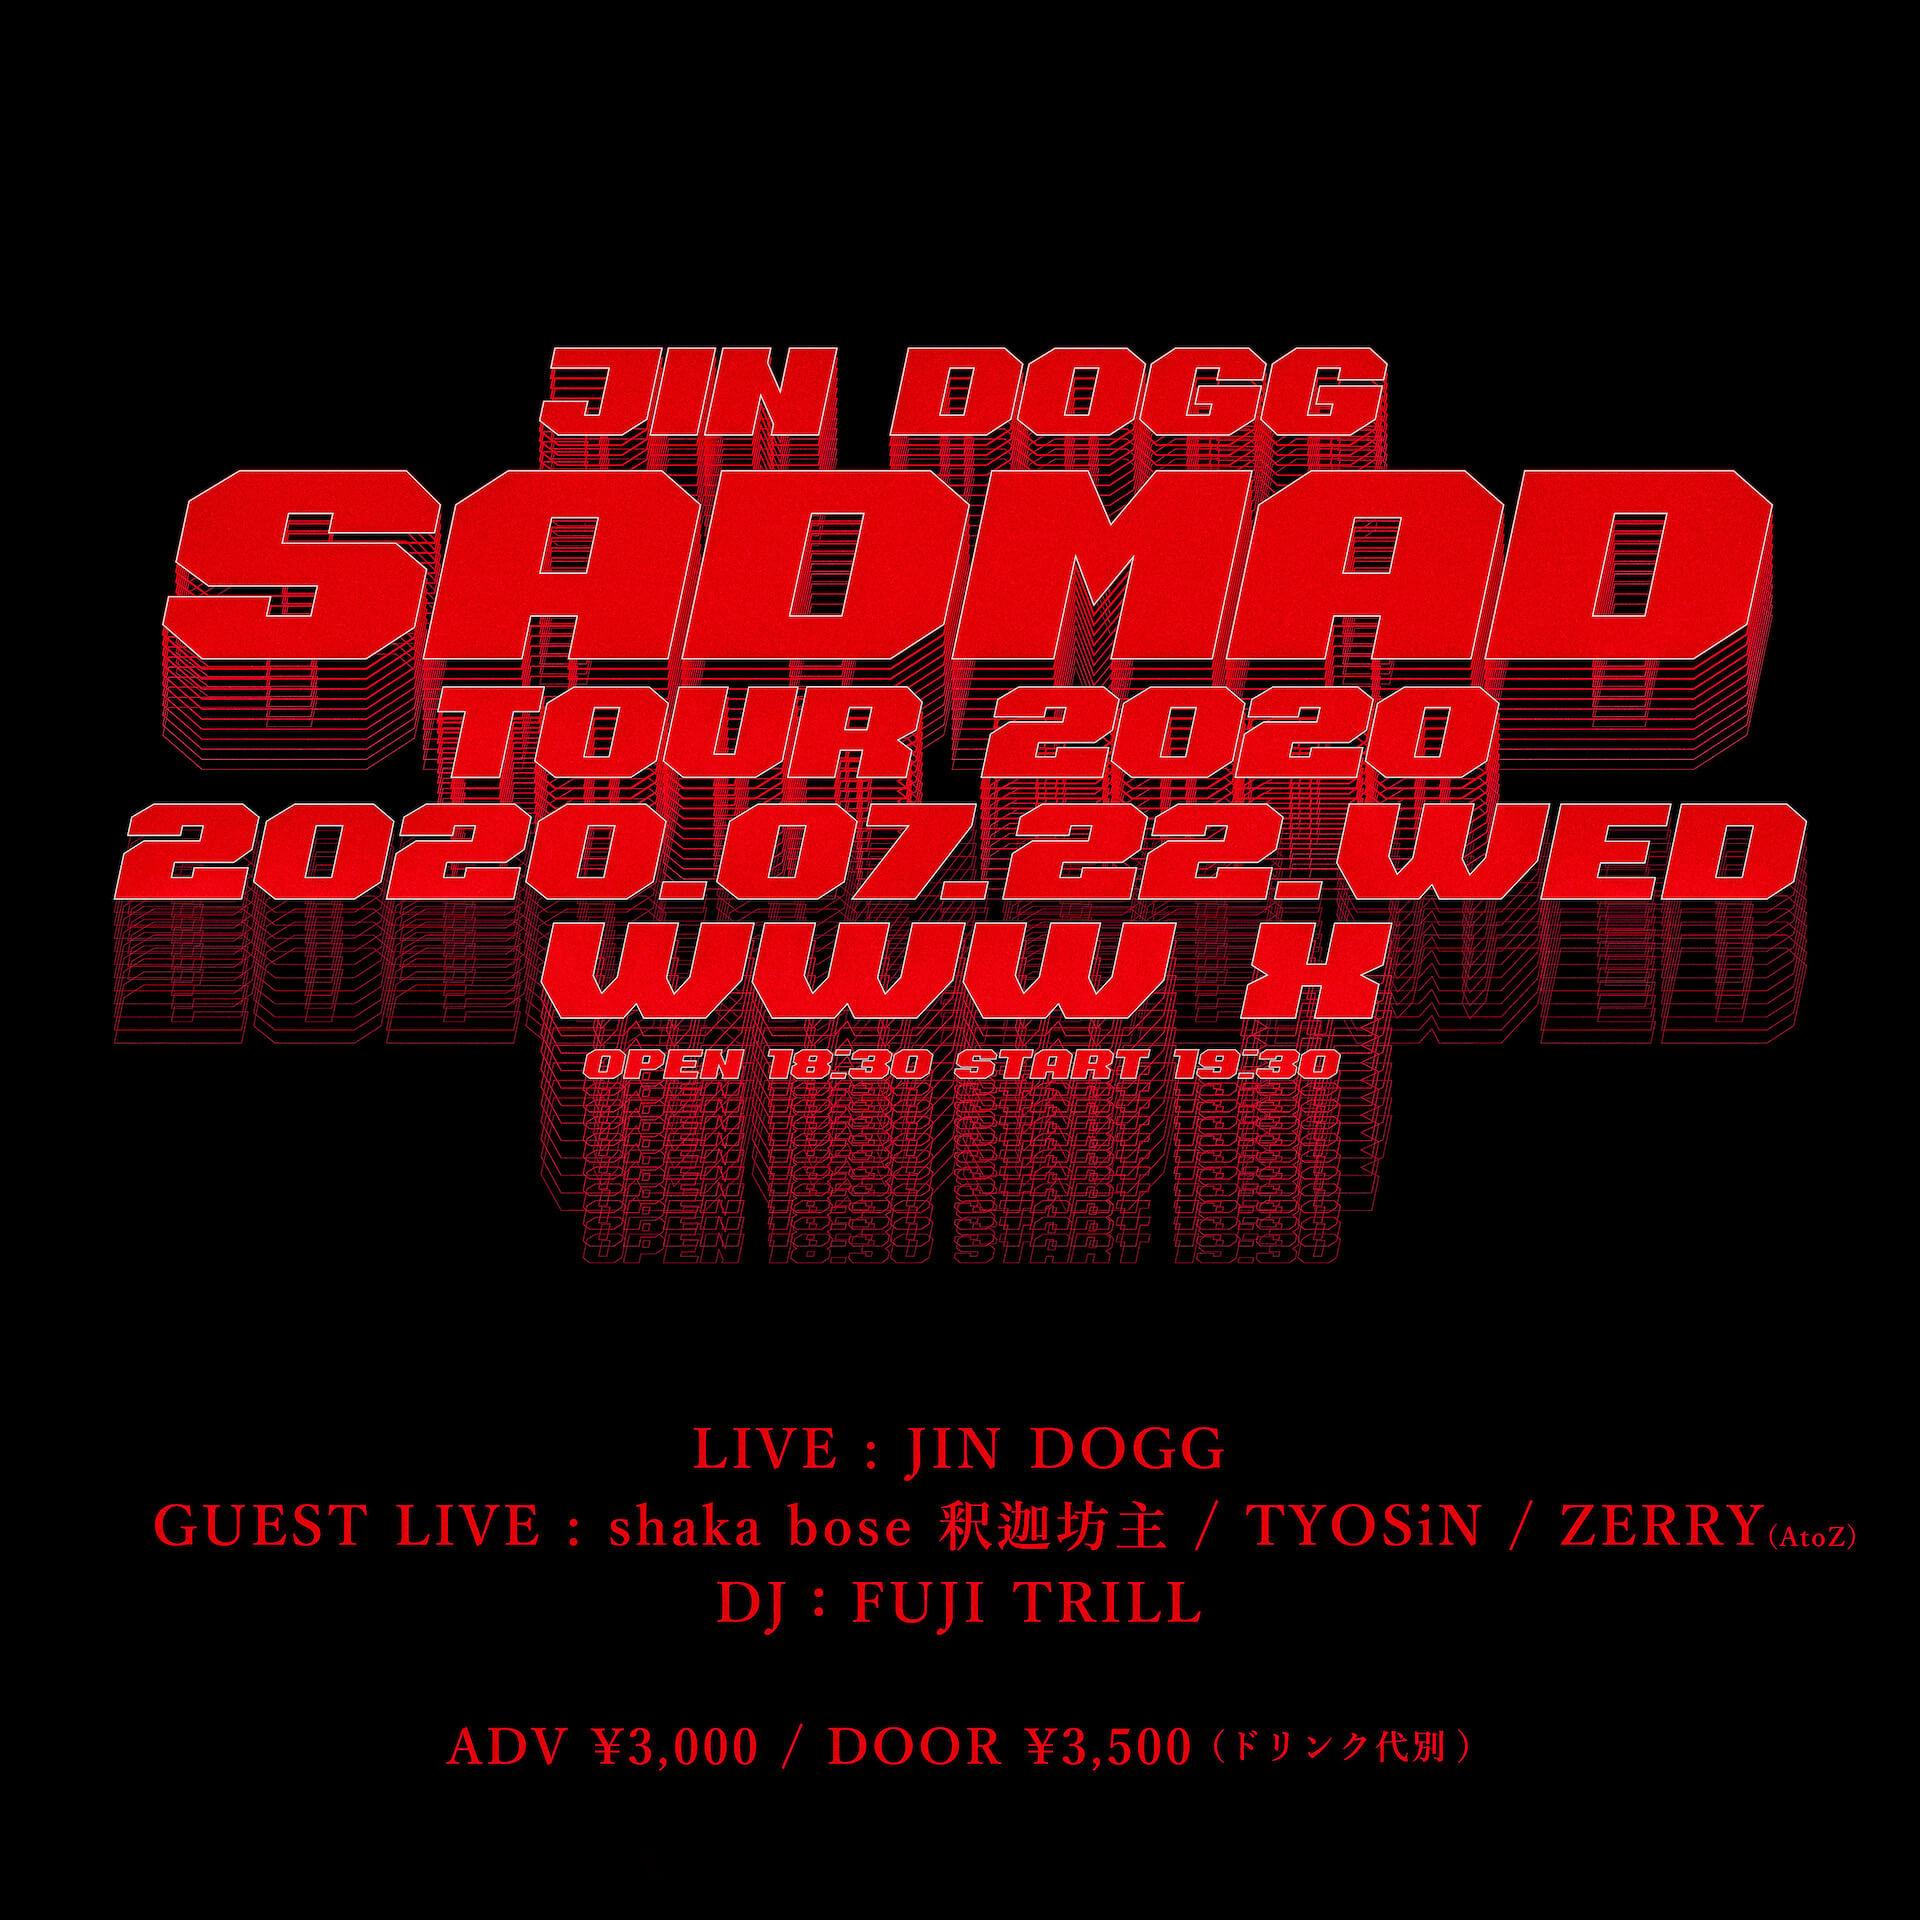 Jin Doggの最新アルバムツアー<SAD MAD TOUR 2020>東京公演が7月開催に延期 music200408_jindogg_1